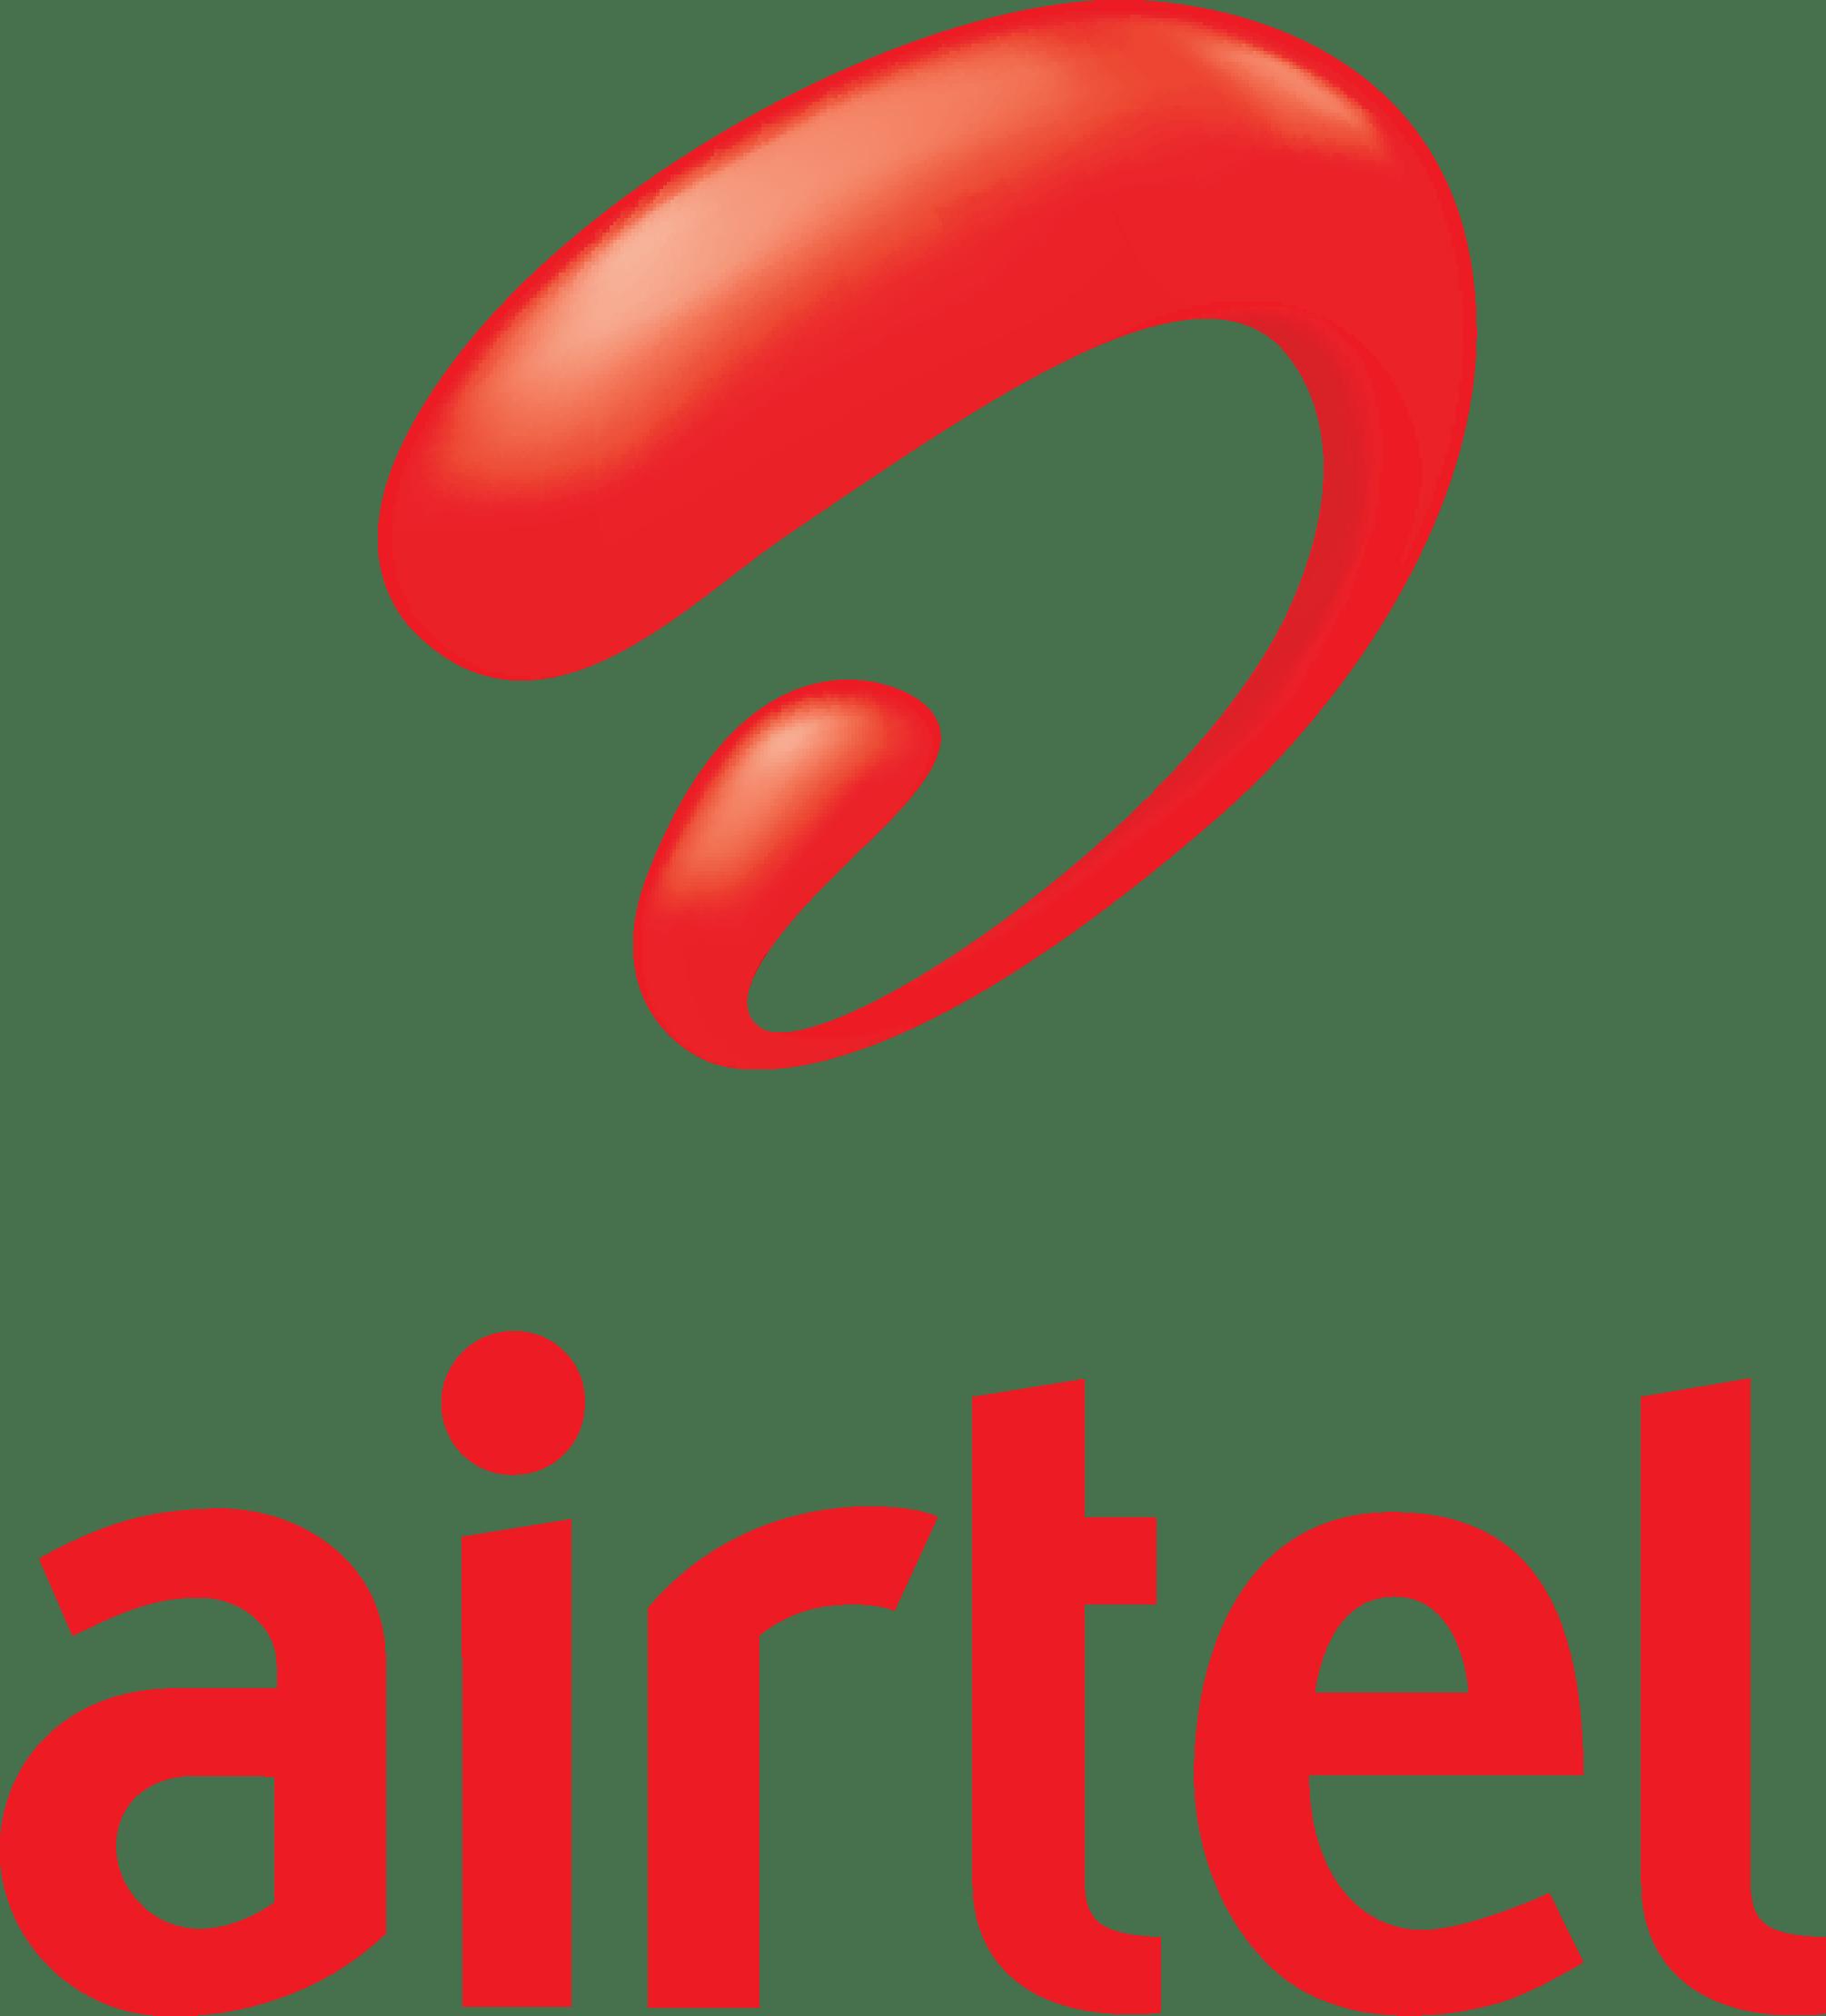 airtel logo vector eps free download logo icons clipart rh freelogovectors net free logo vectors download free logo vectors illustrator